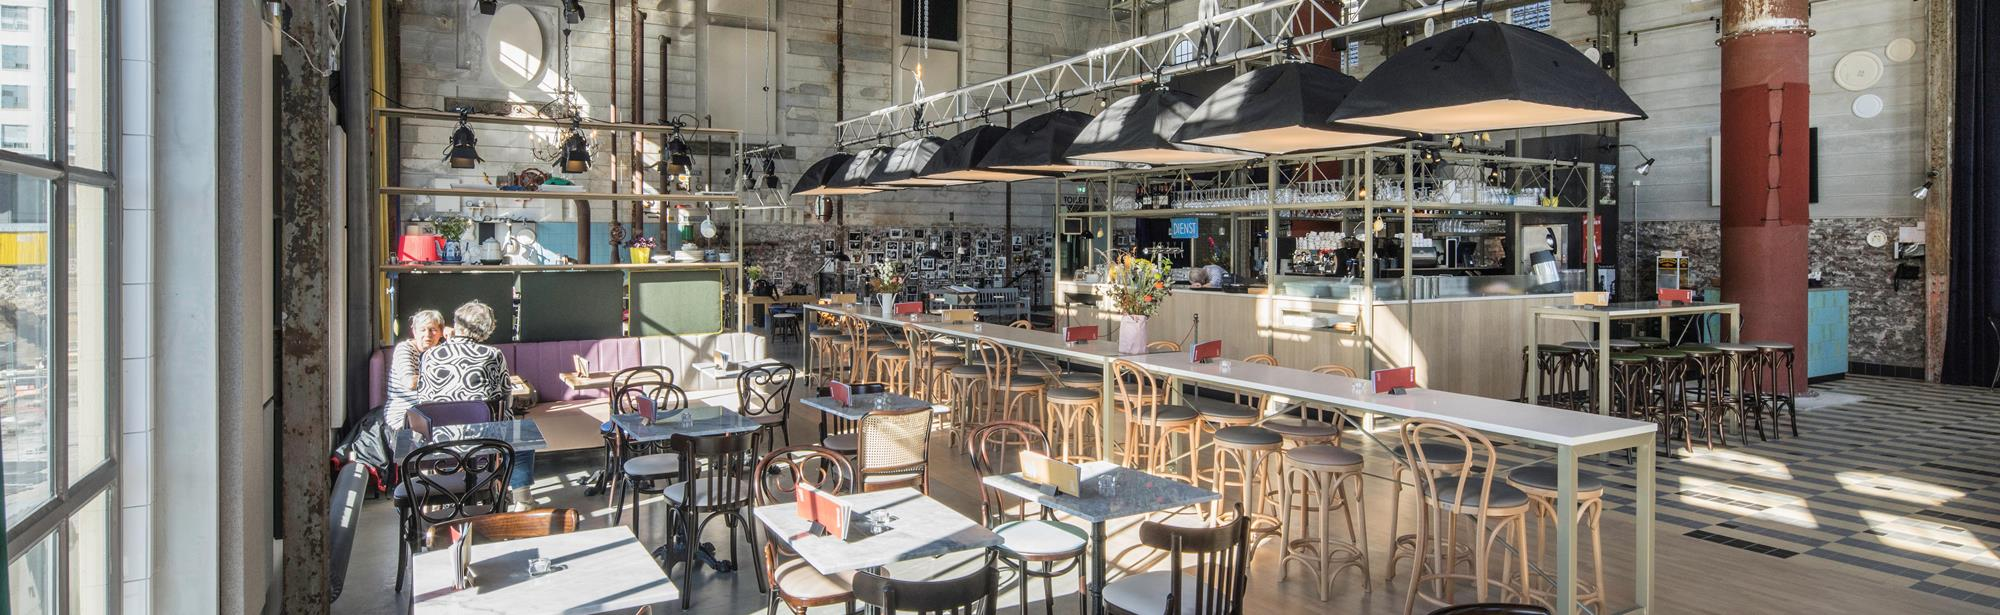 Lumière Cinema Restaurant Café Maastricht